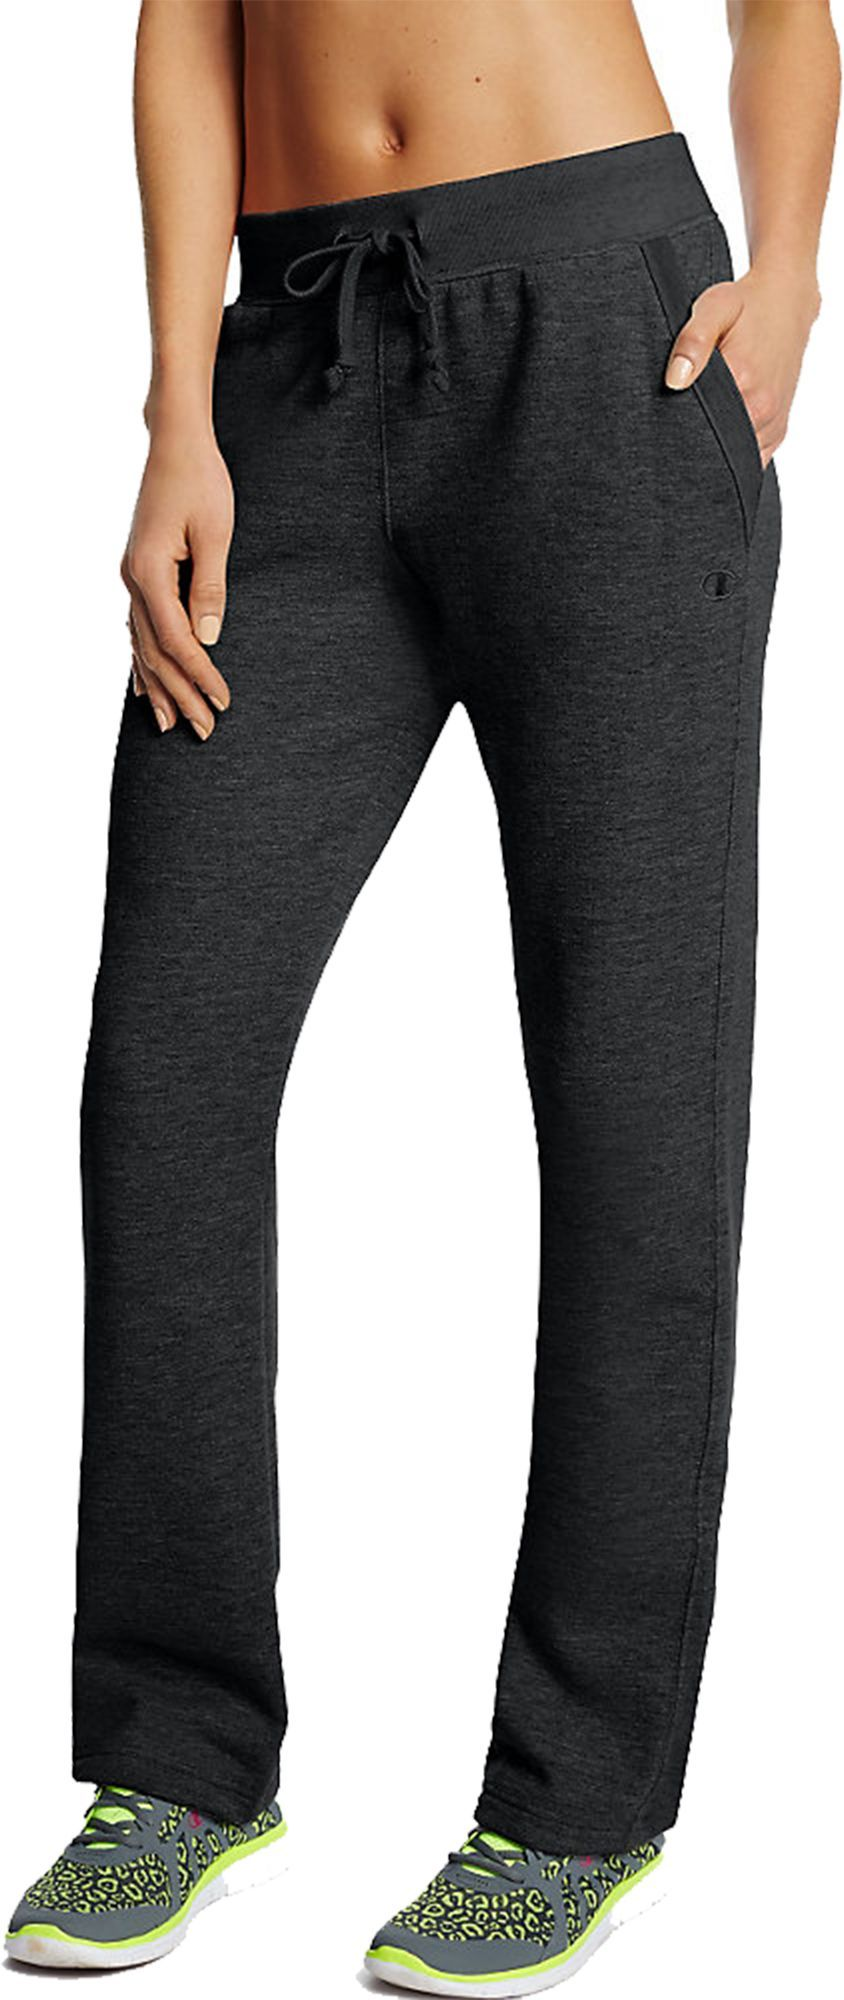 0c0800efaaa57 Champion Women s Fleece Open Bottom Pants